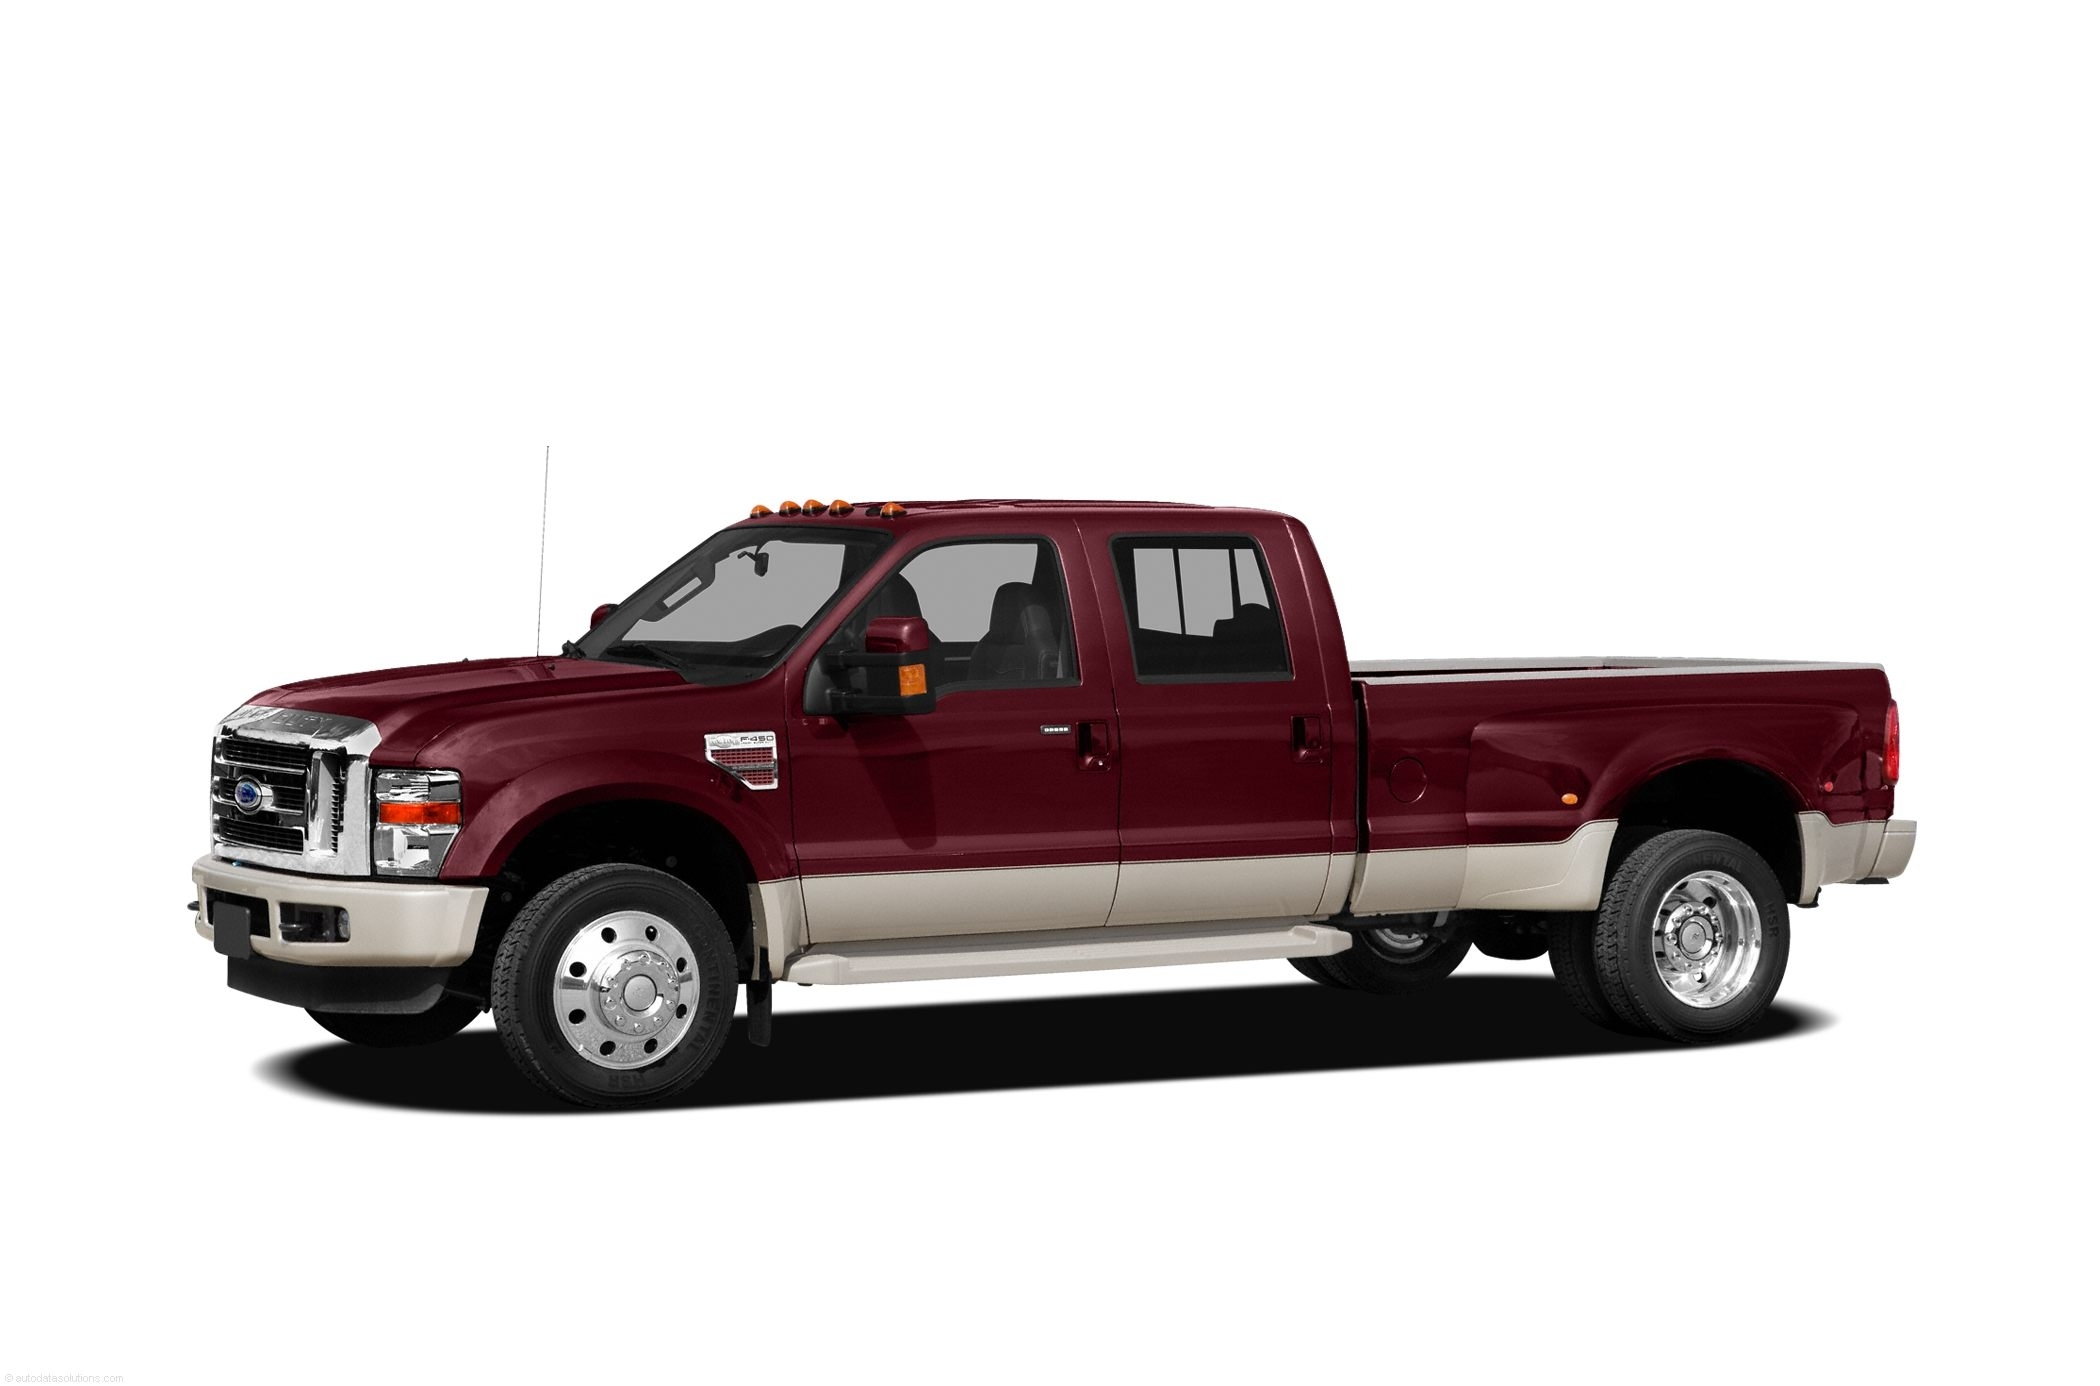 Chevy Silverado Invoice Price